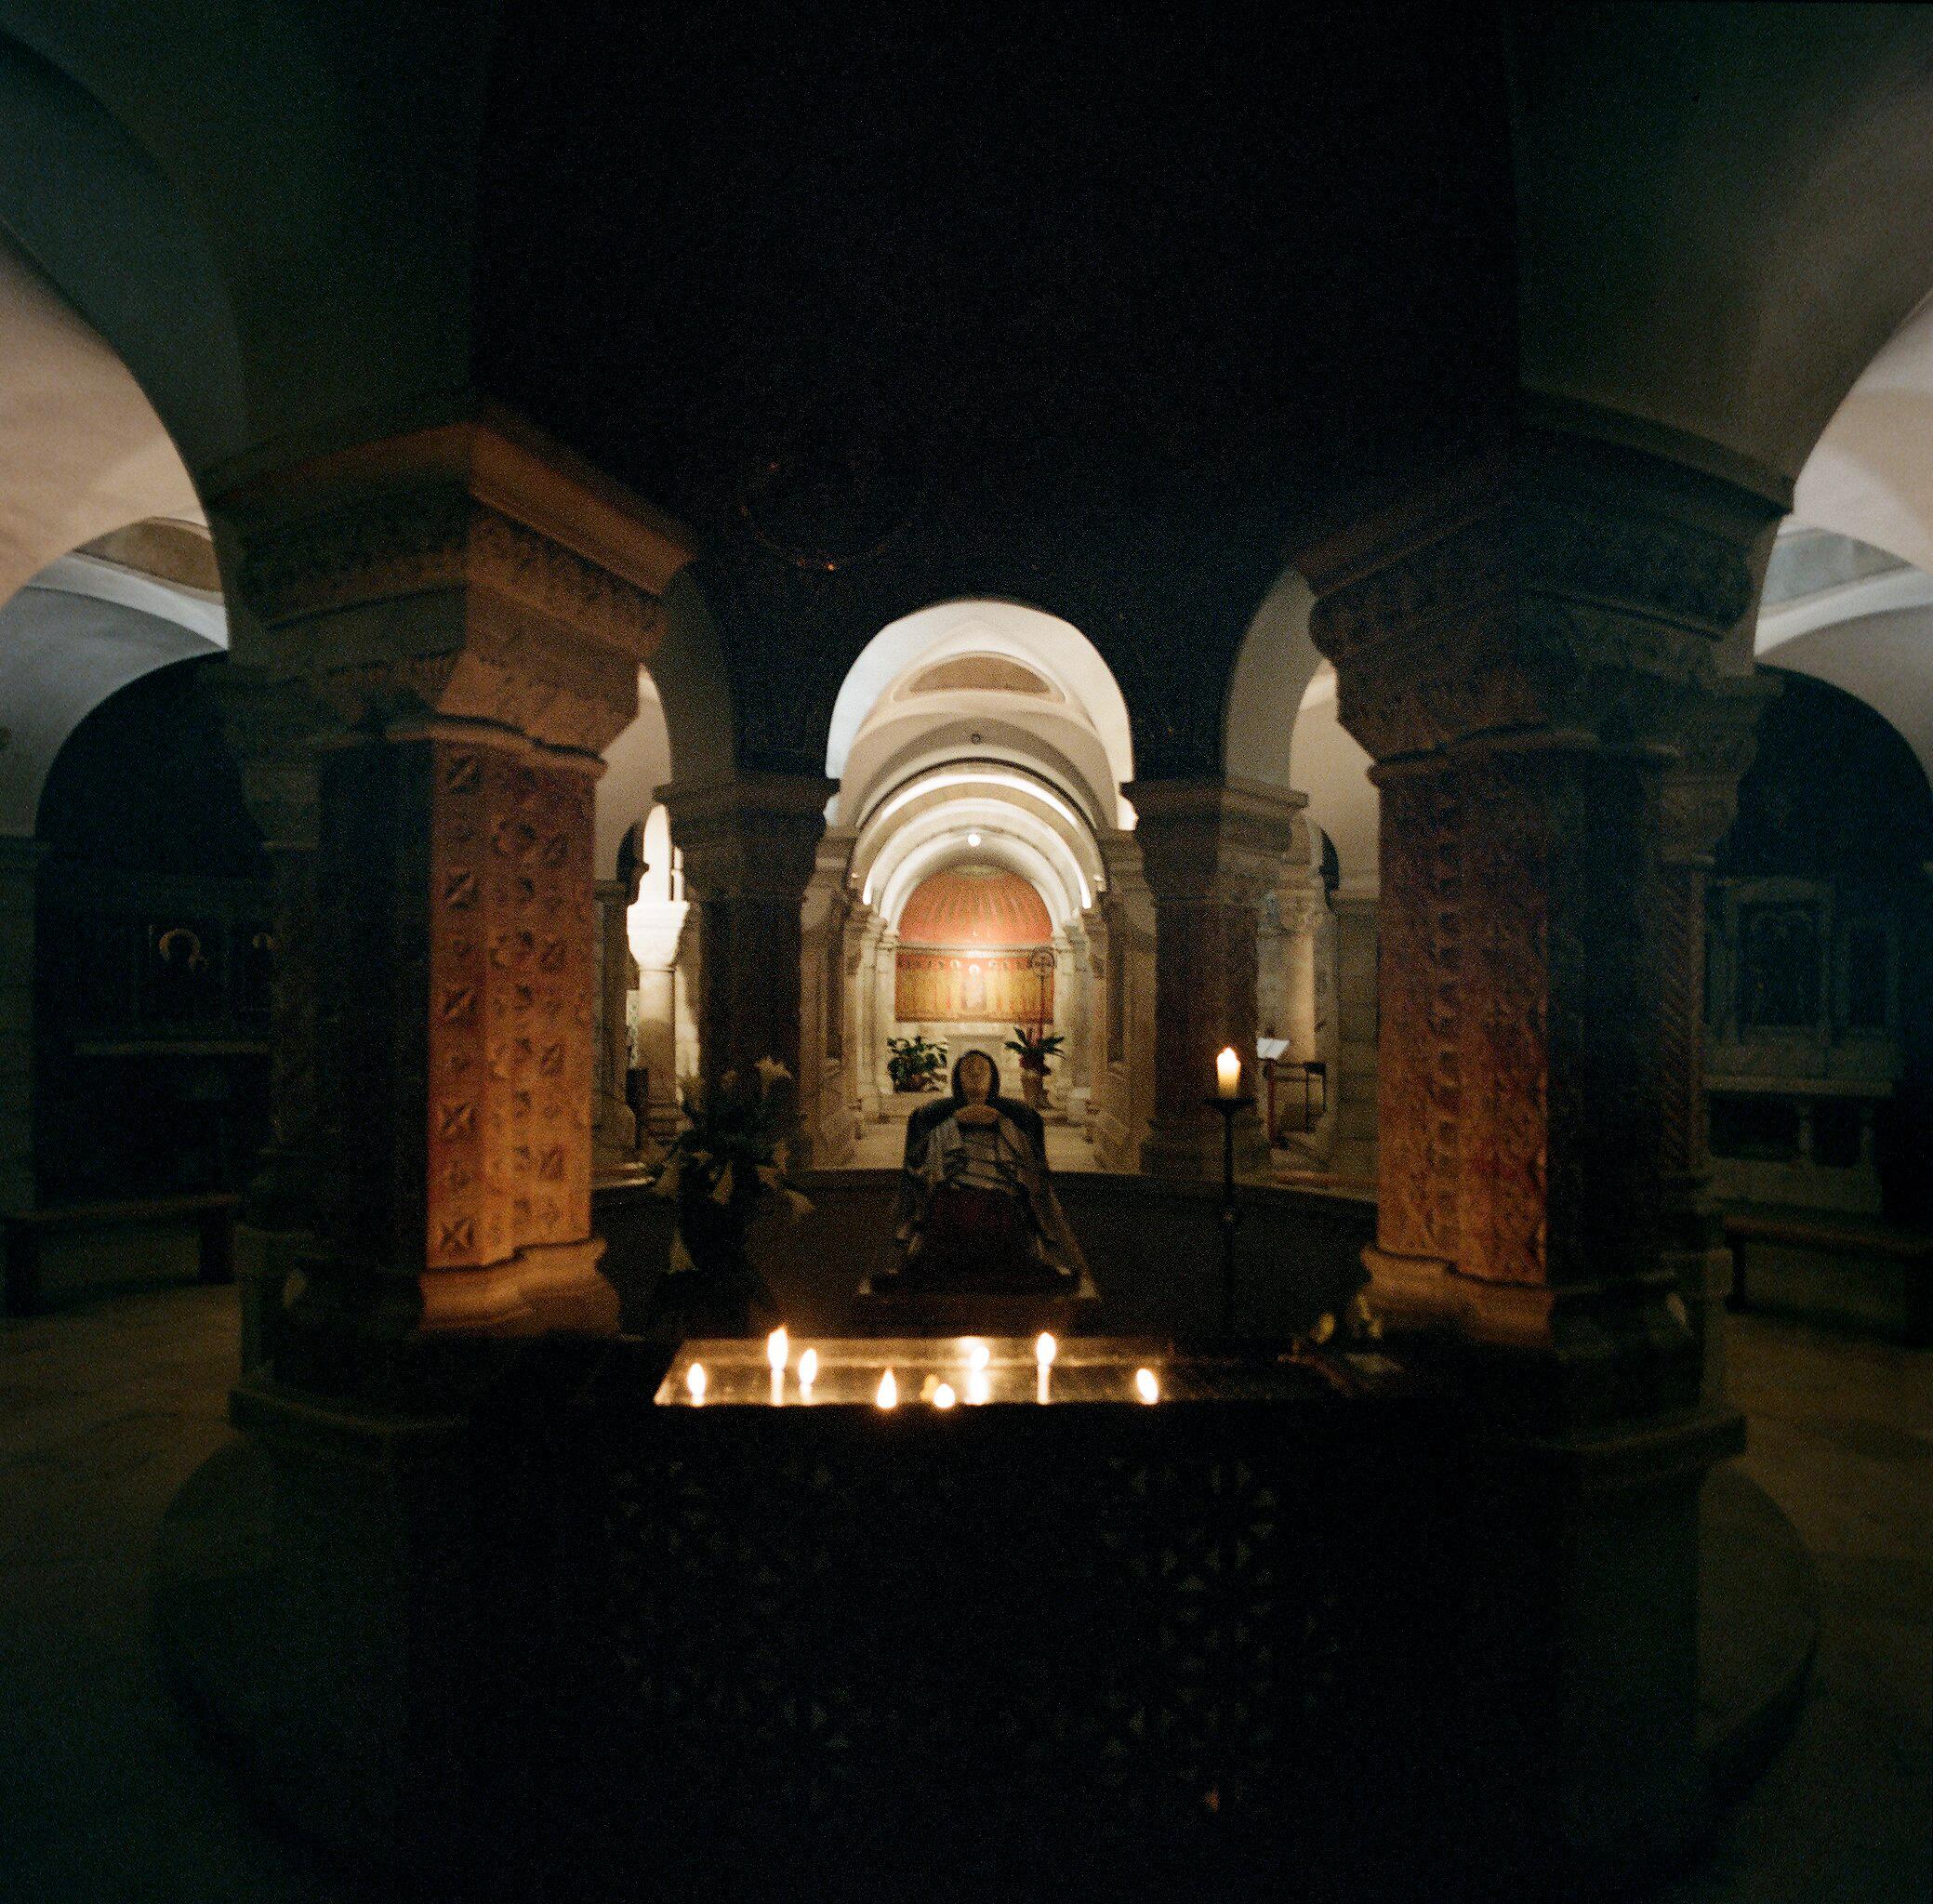 Crypt of the Basilica of the Assumption, Jerusalem, Israel.